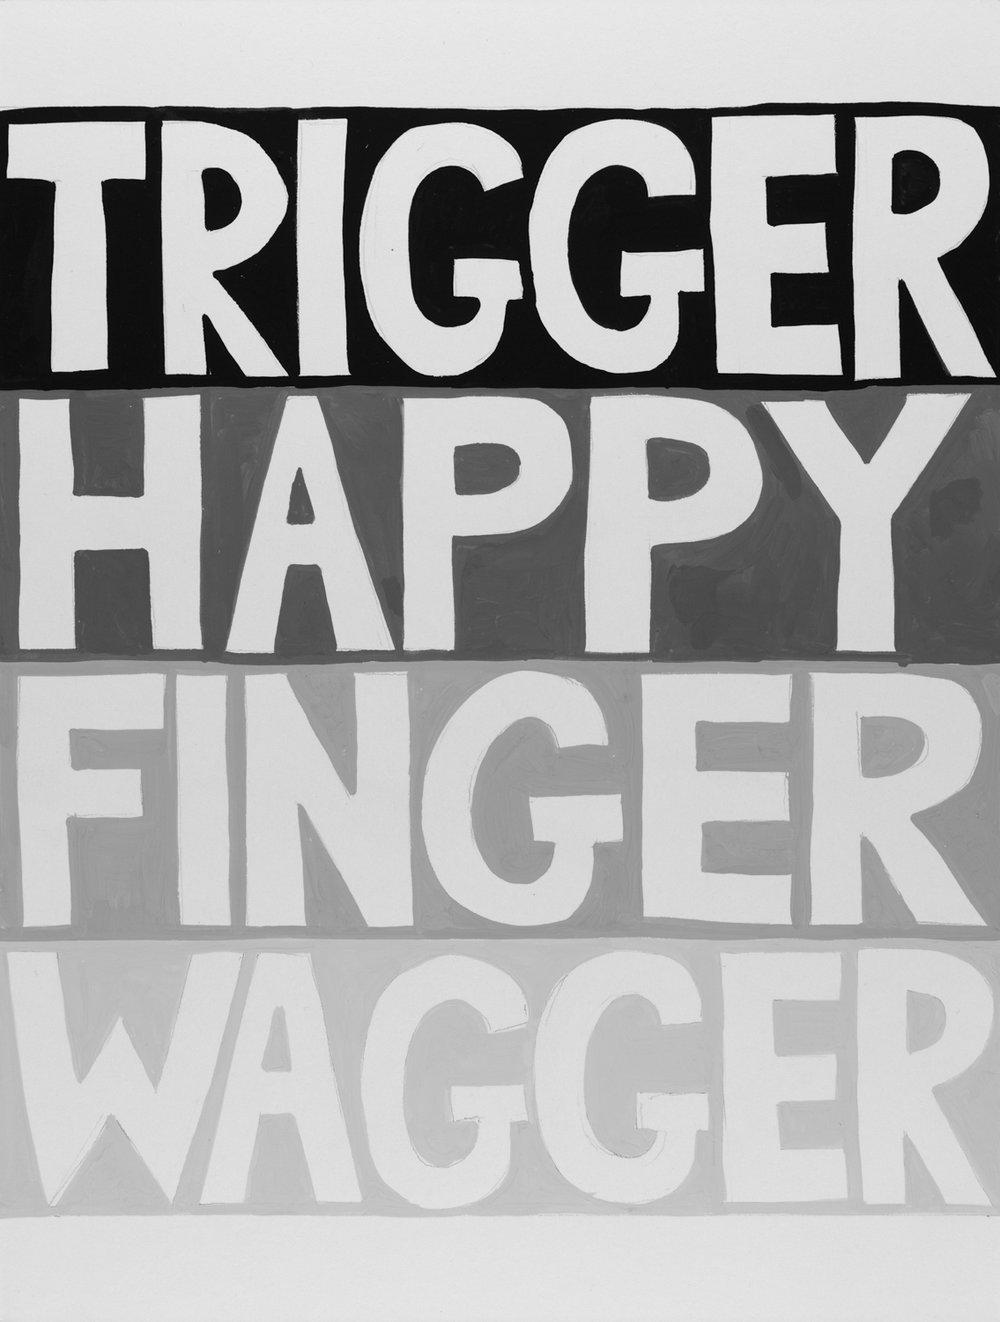 triggerhappyfingerwagger.jpg